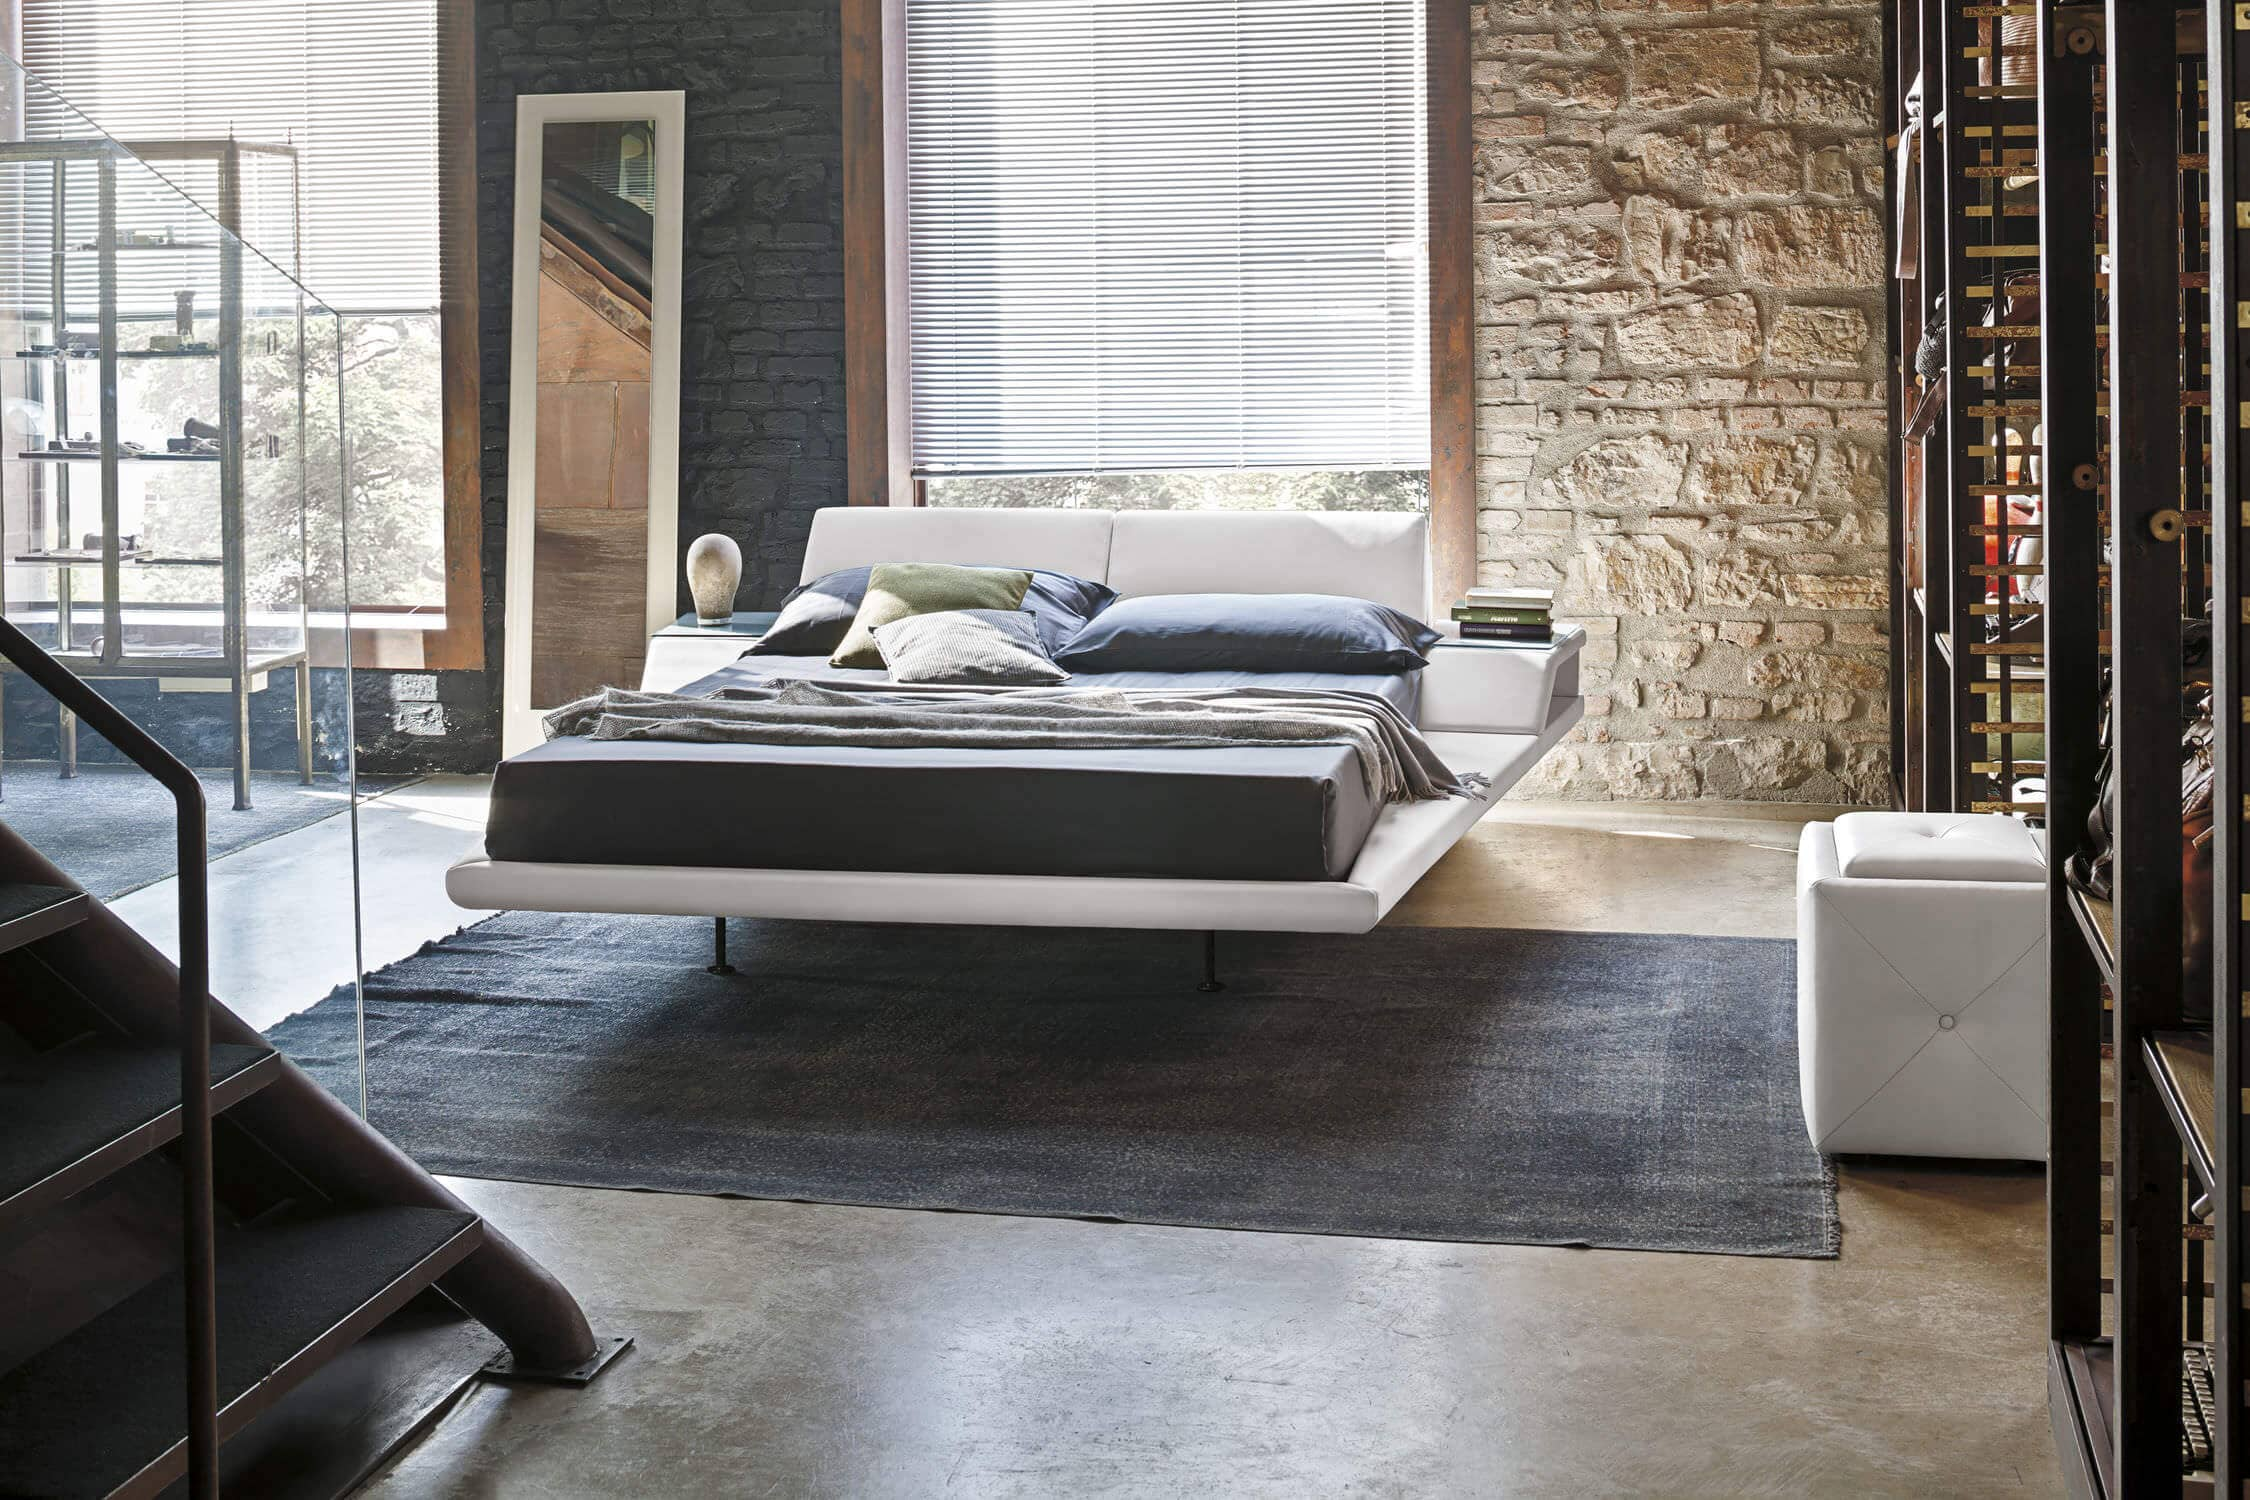 Minimalist White Bed With Side Storage